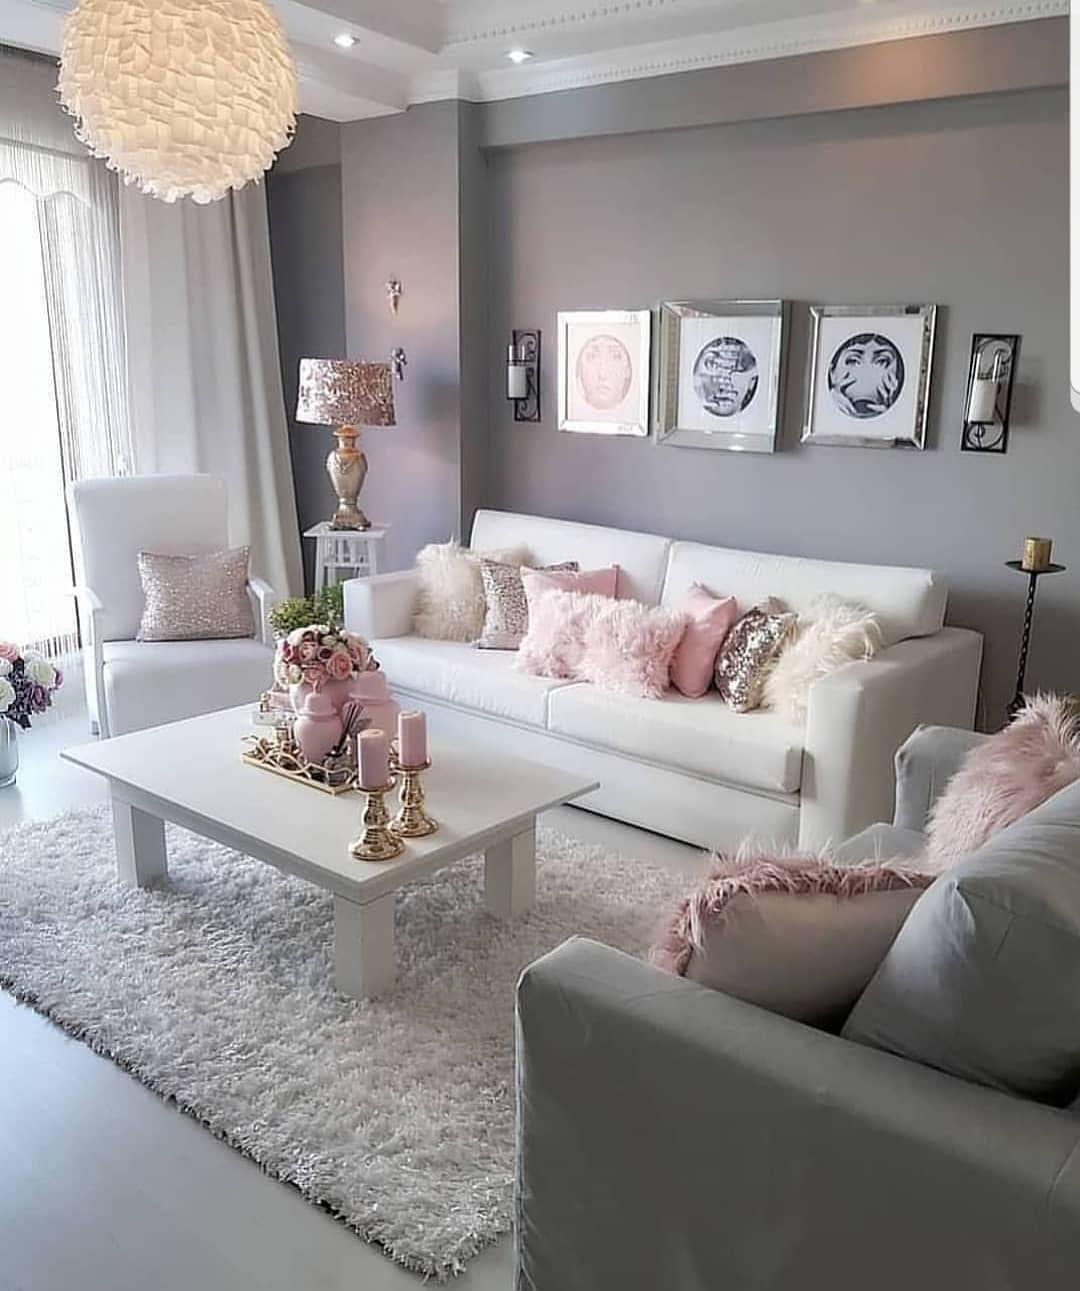 Top 70 Home Design Trends In 2020 In 2020 Living Room Decor Apartment Romantic Living Room Living Room Decor Cozy